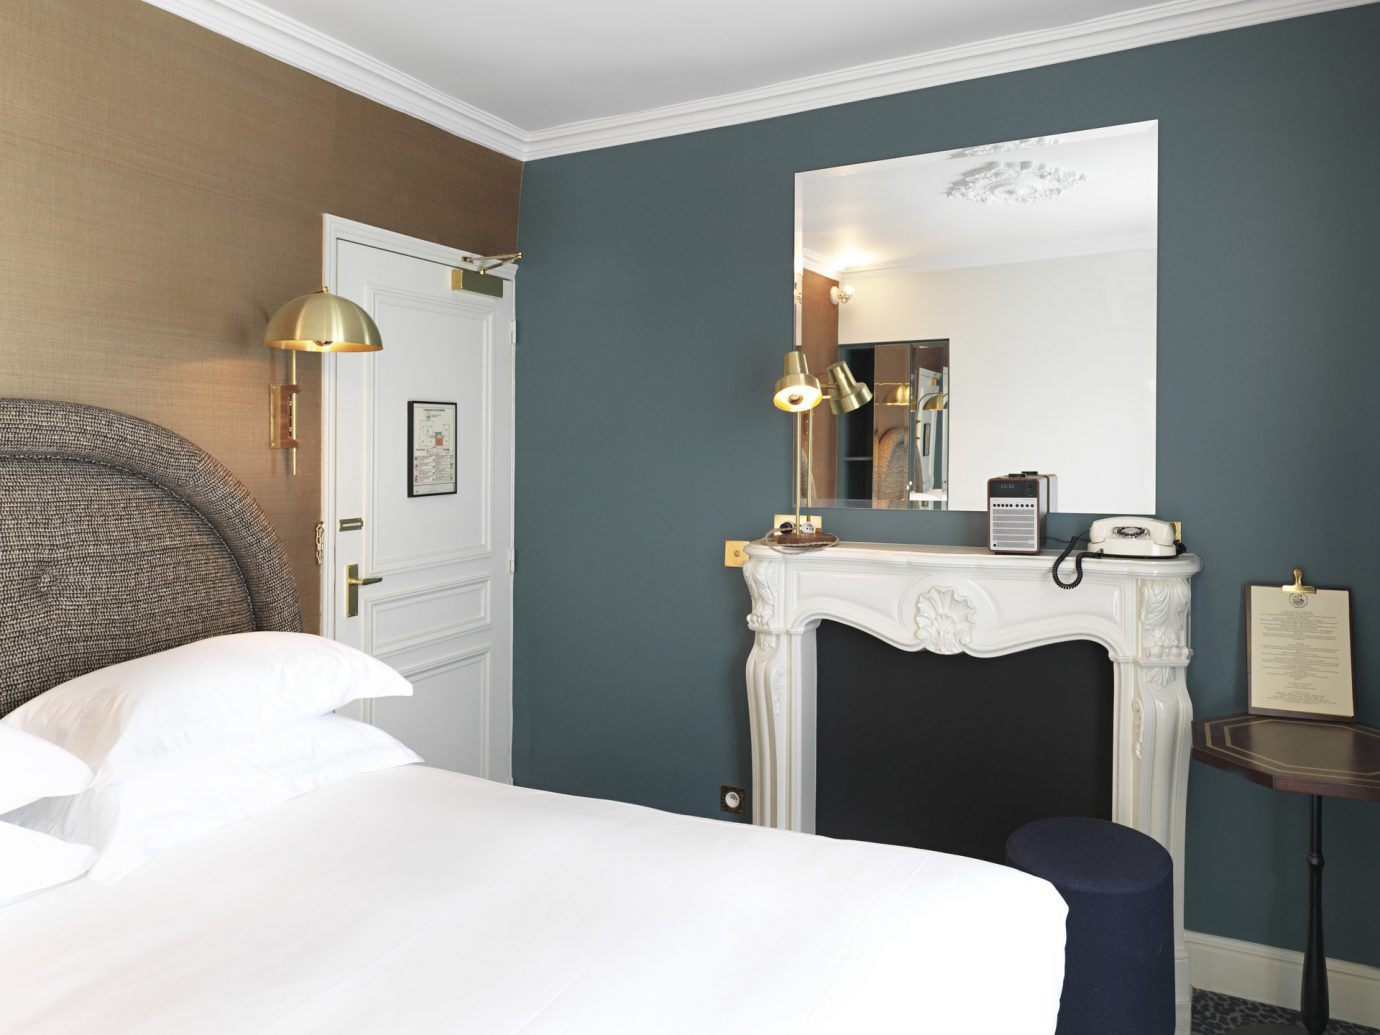 bed Bedroom Hotels interior indoor wall room property ceiling scene Suite interior design floor hotel furniture apartment